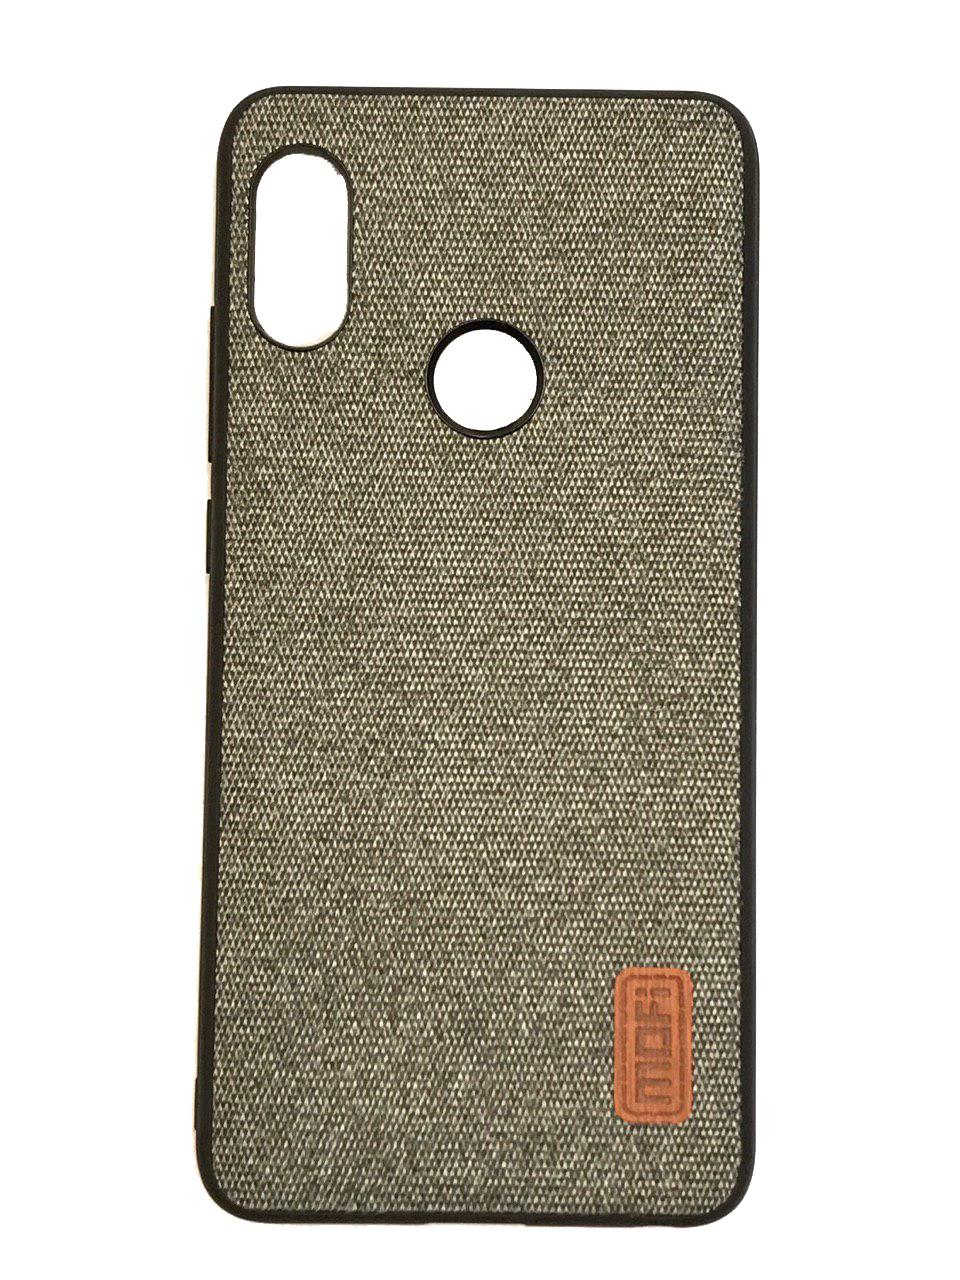 Чехол для сотового телефона Mofi Накладка Fabric Xiaomi Mi 6X /A2 Gray, серый unit ucw 5100